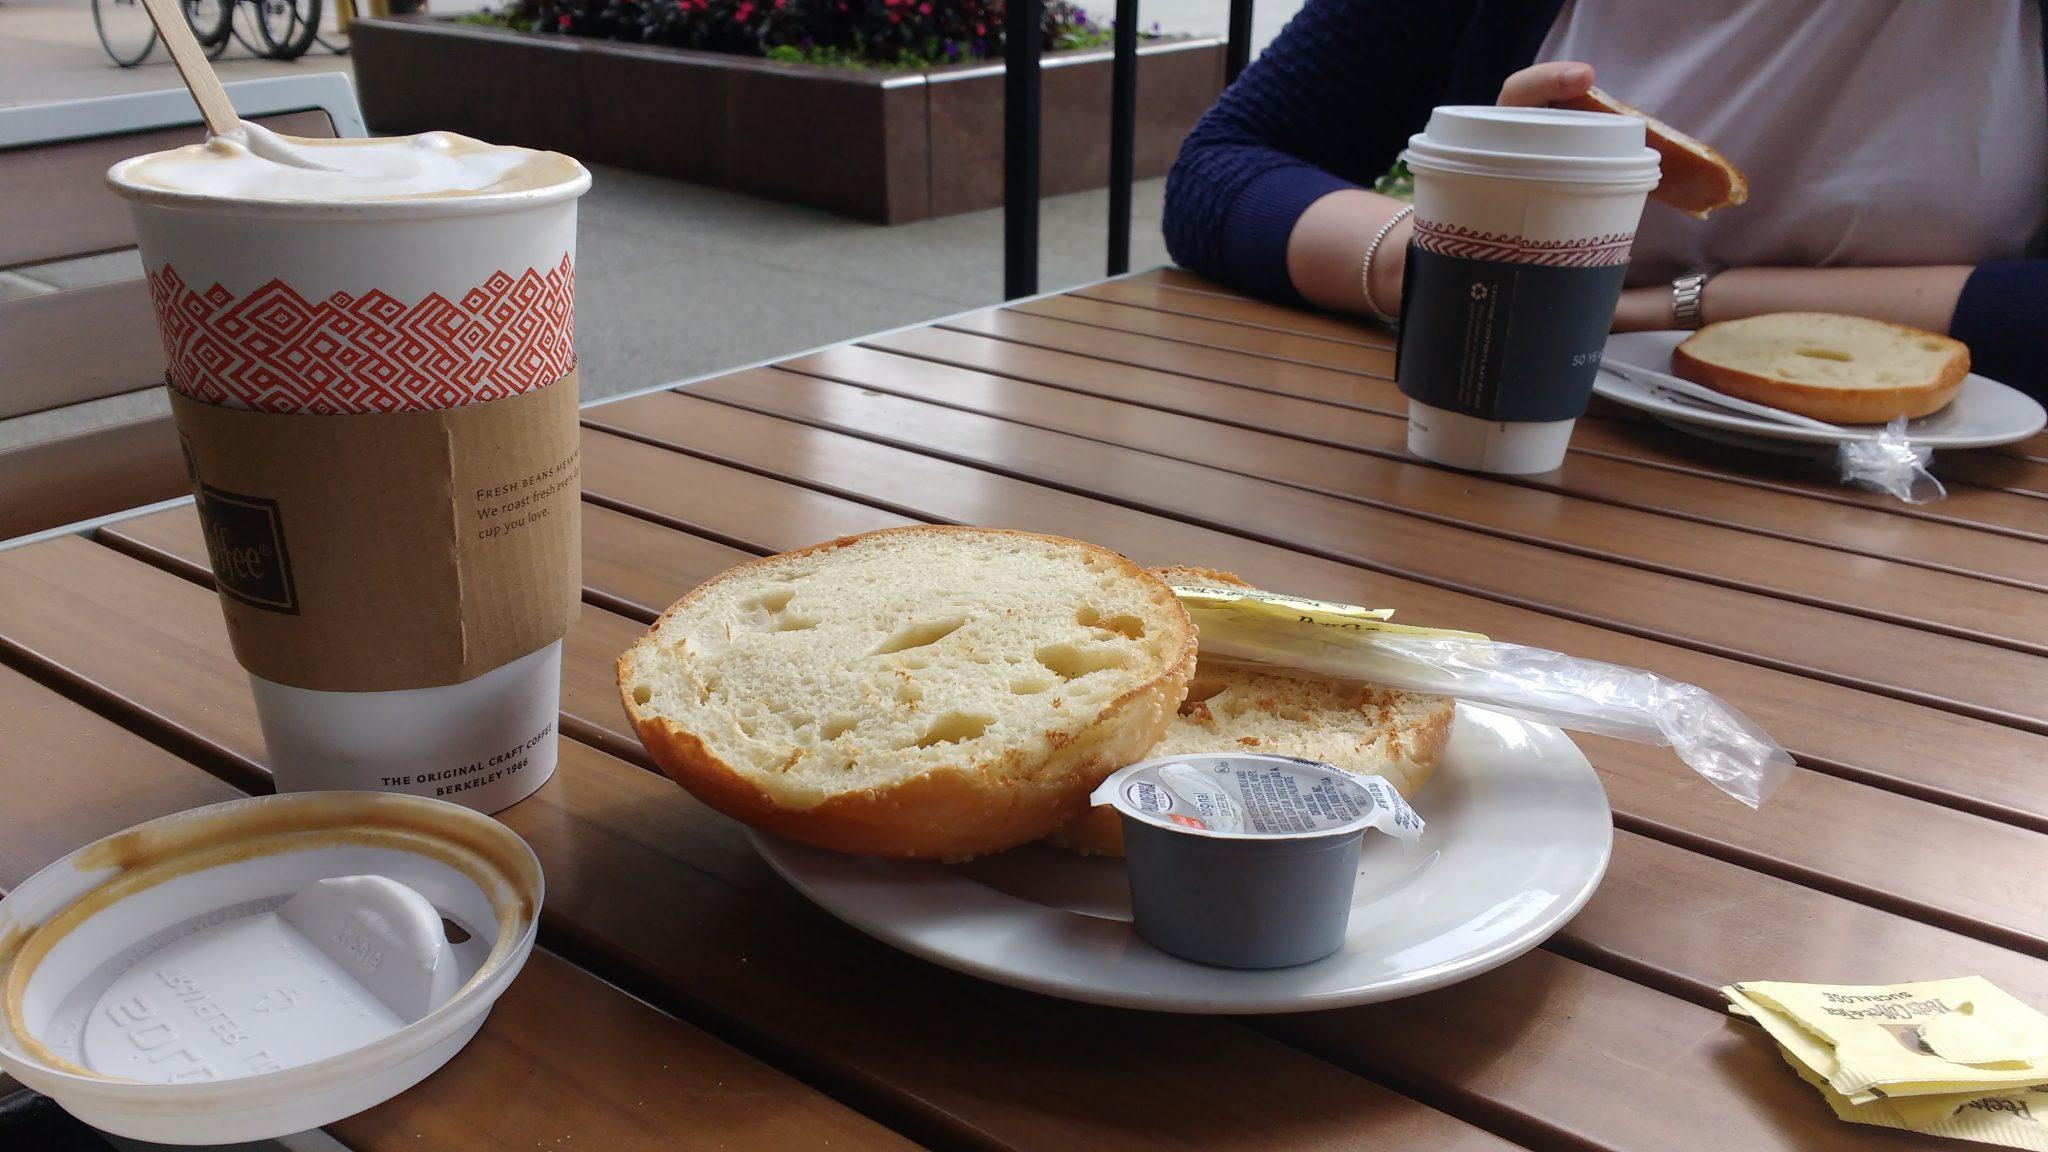 Cream Cheese Bagel Latte Peete's Coffee